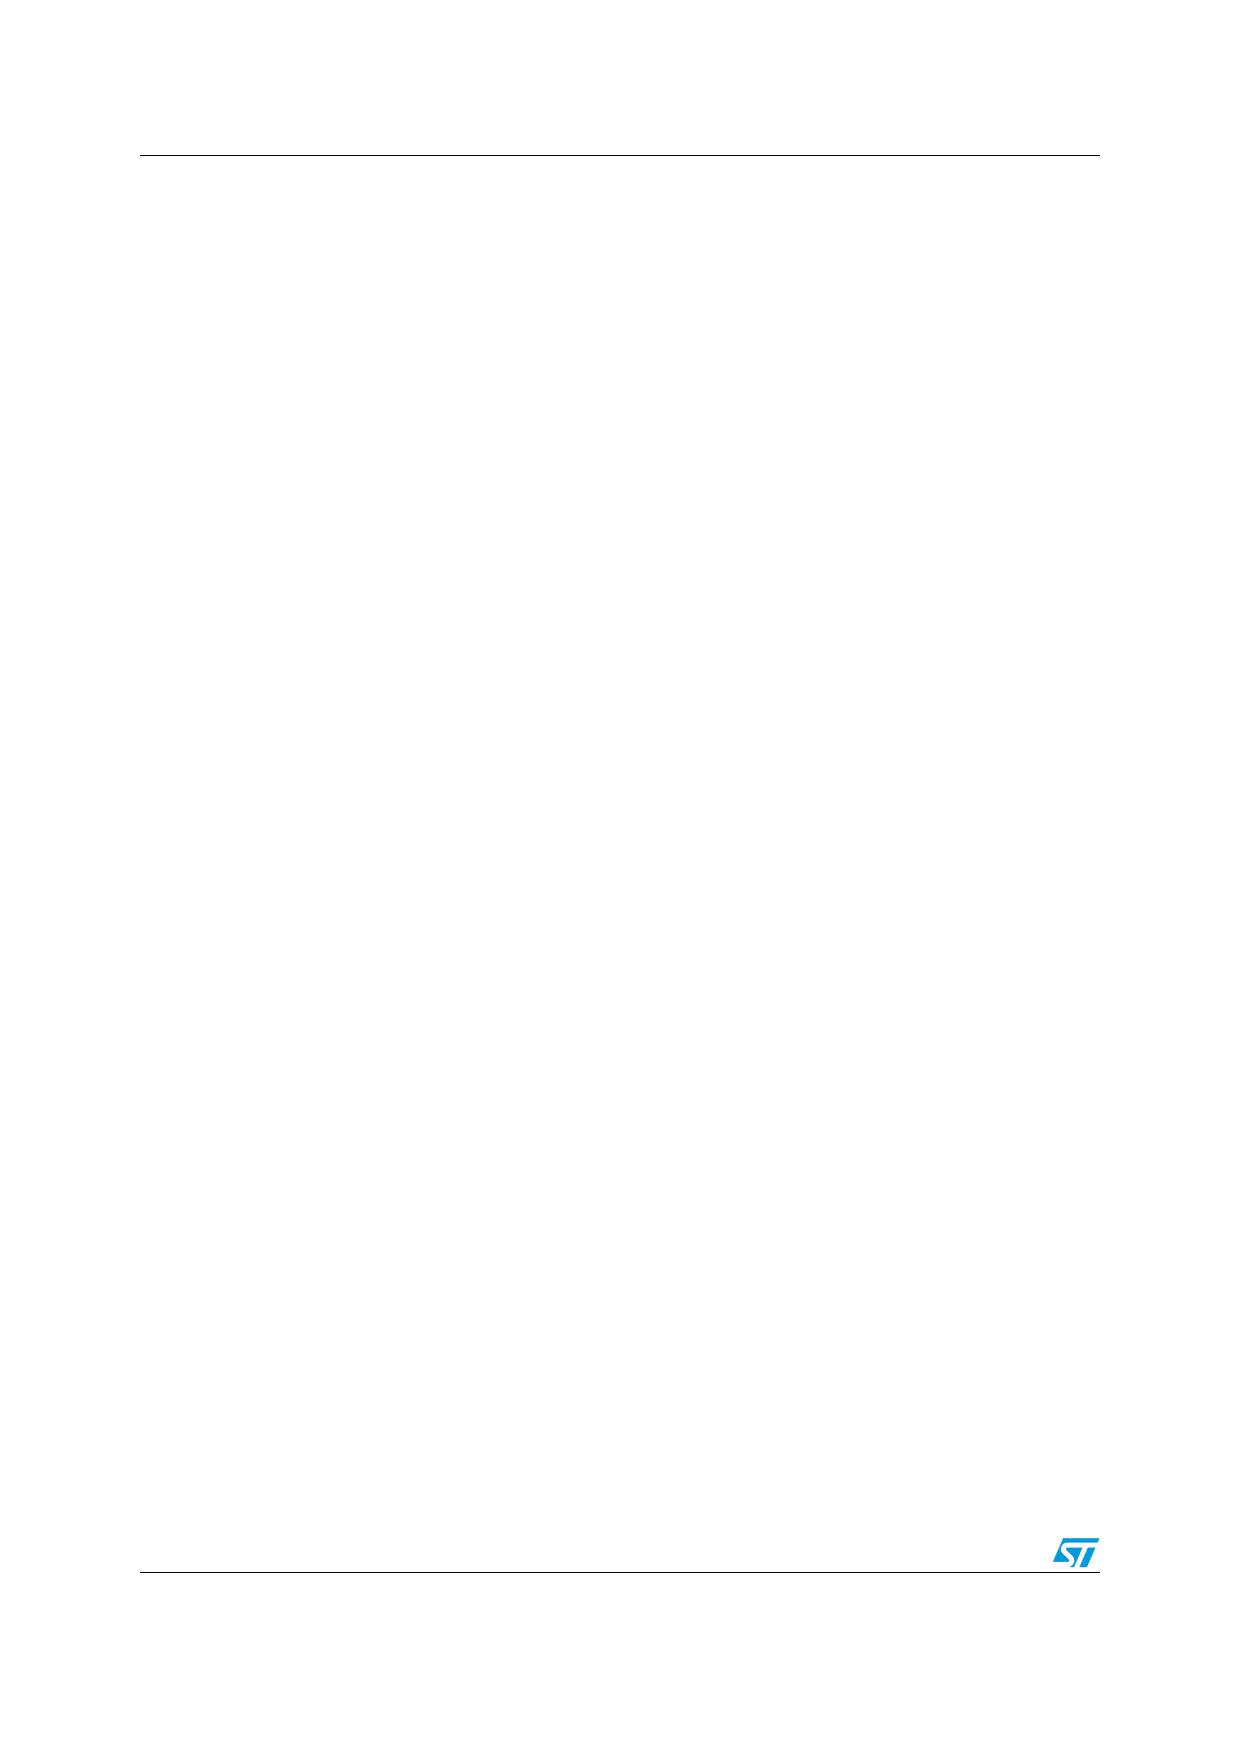 B140NF75 Даташит, Описание, Даташиты